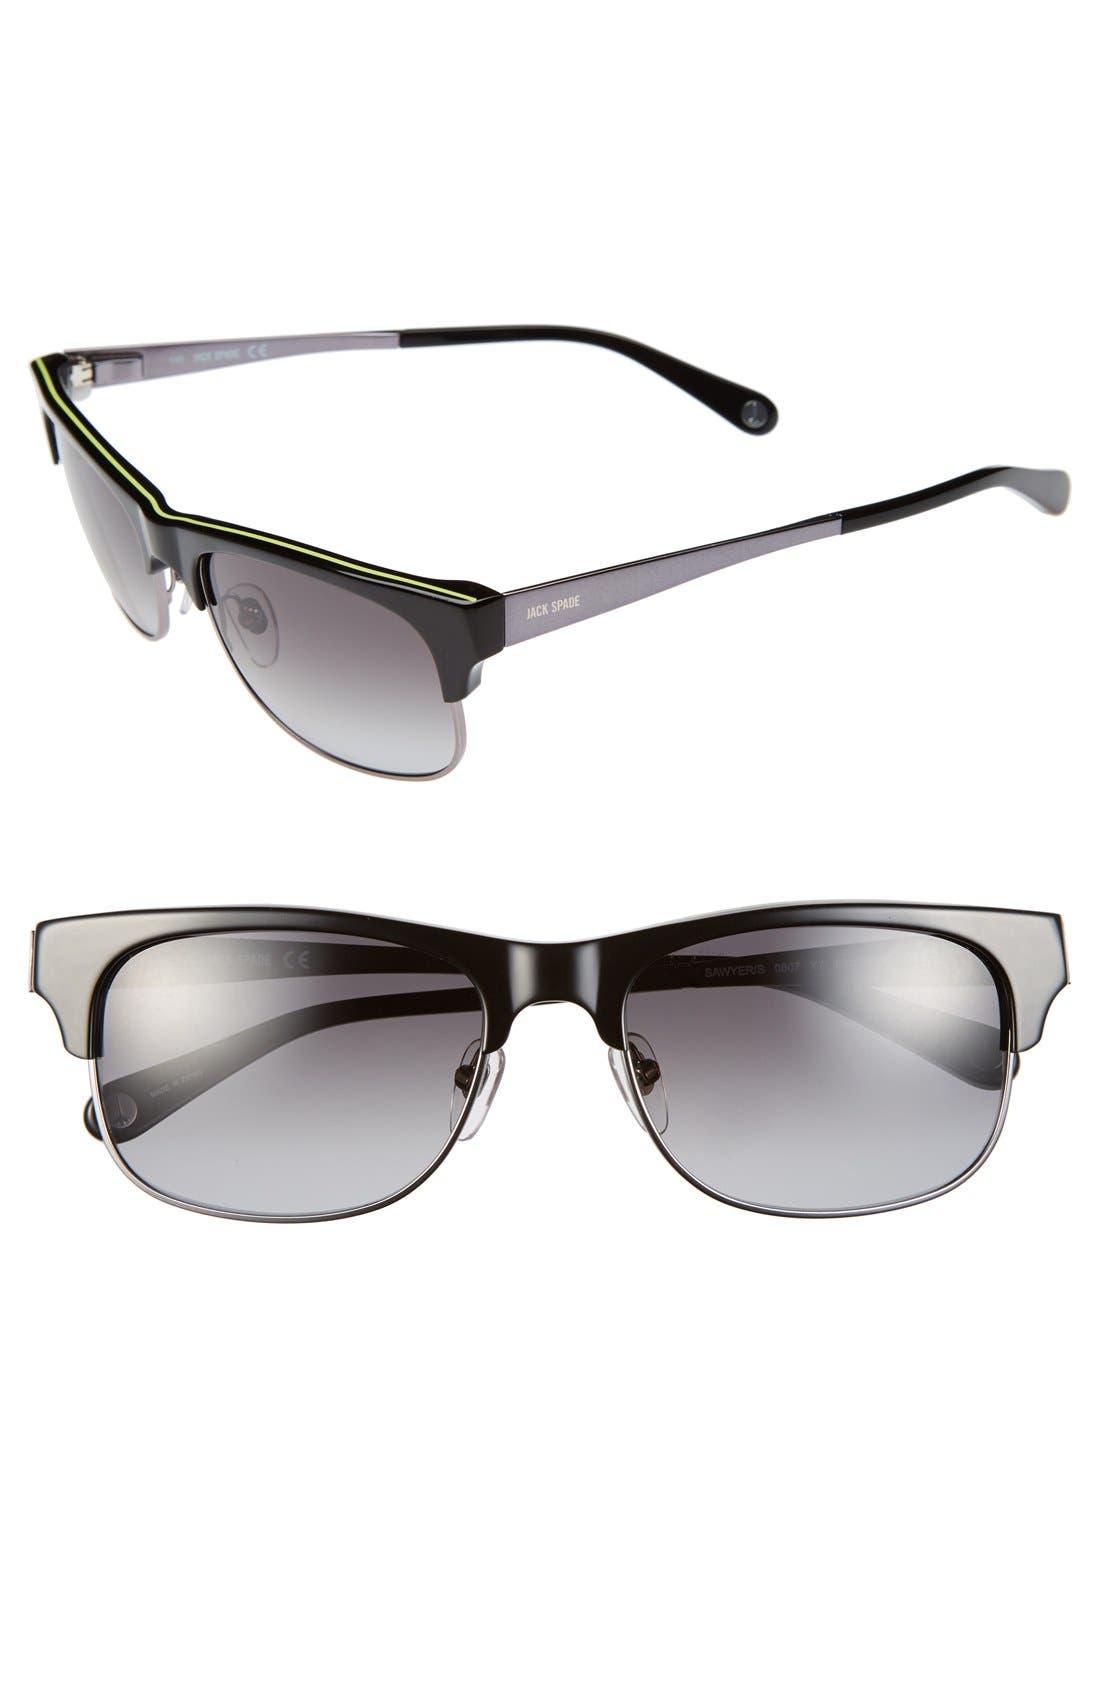 Alternate Image 1 Selected - Jack Spade 'Sawyer' 55mm Sunglasses